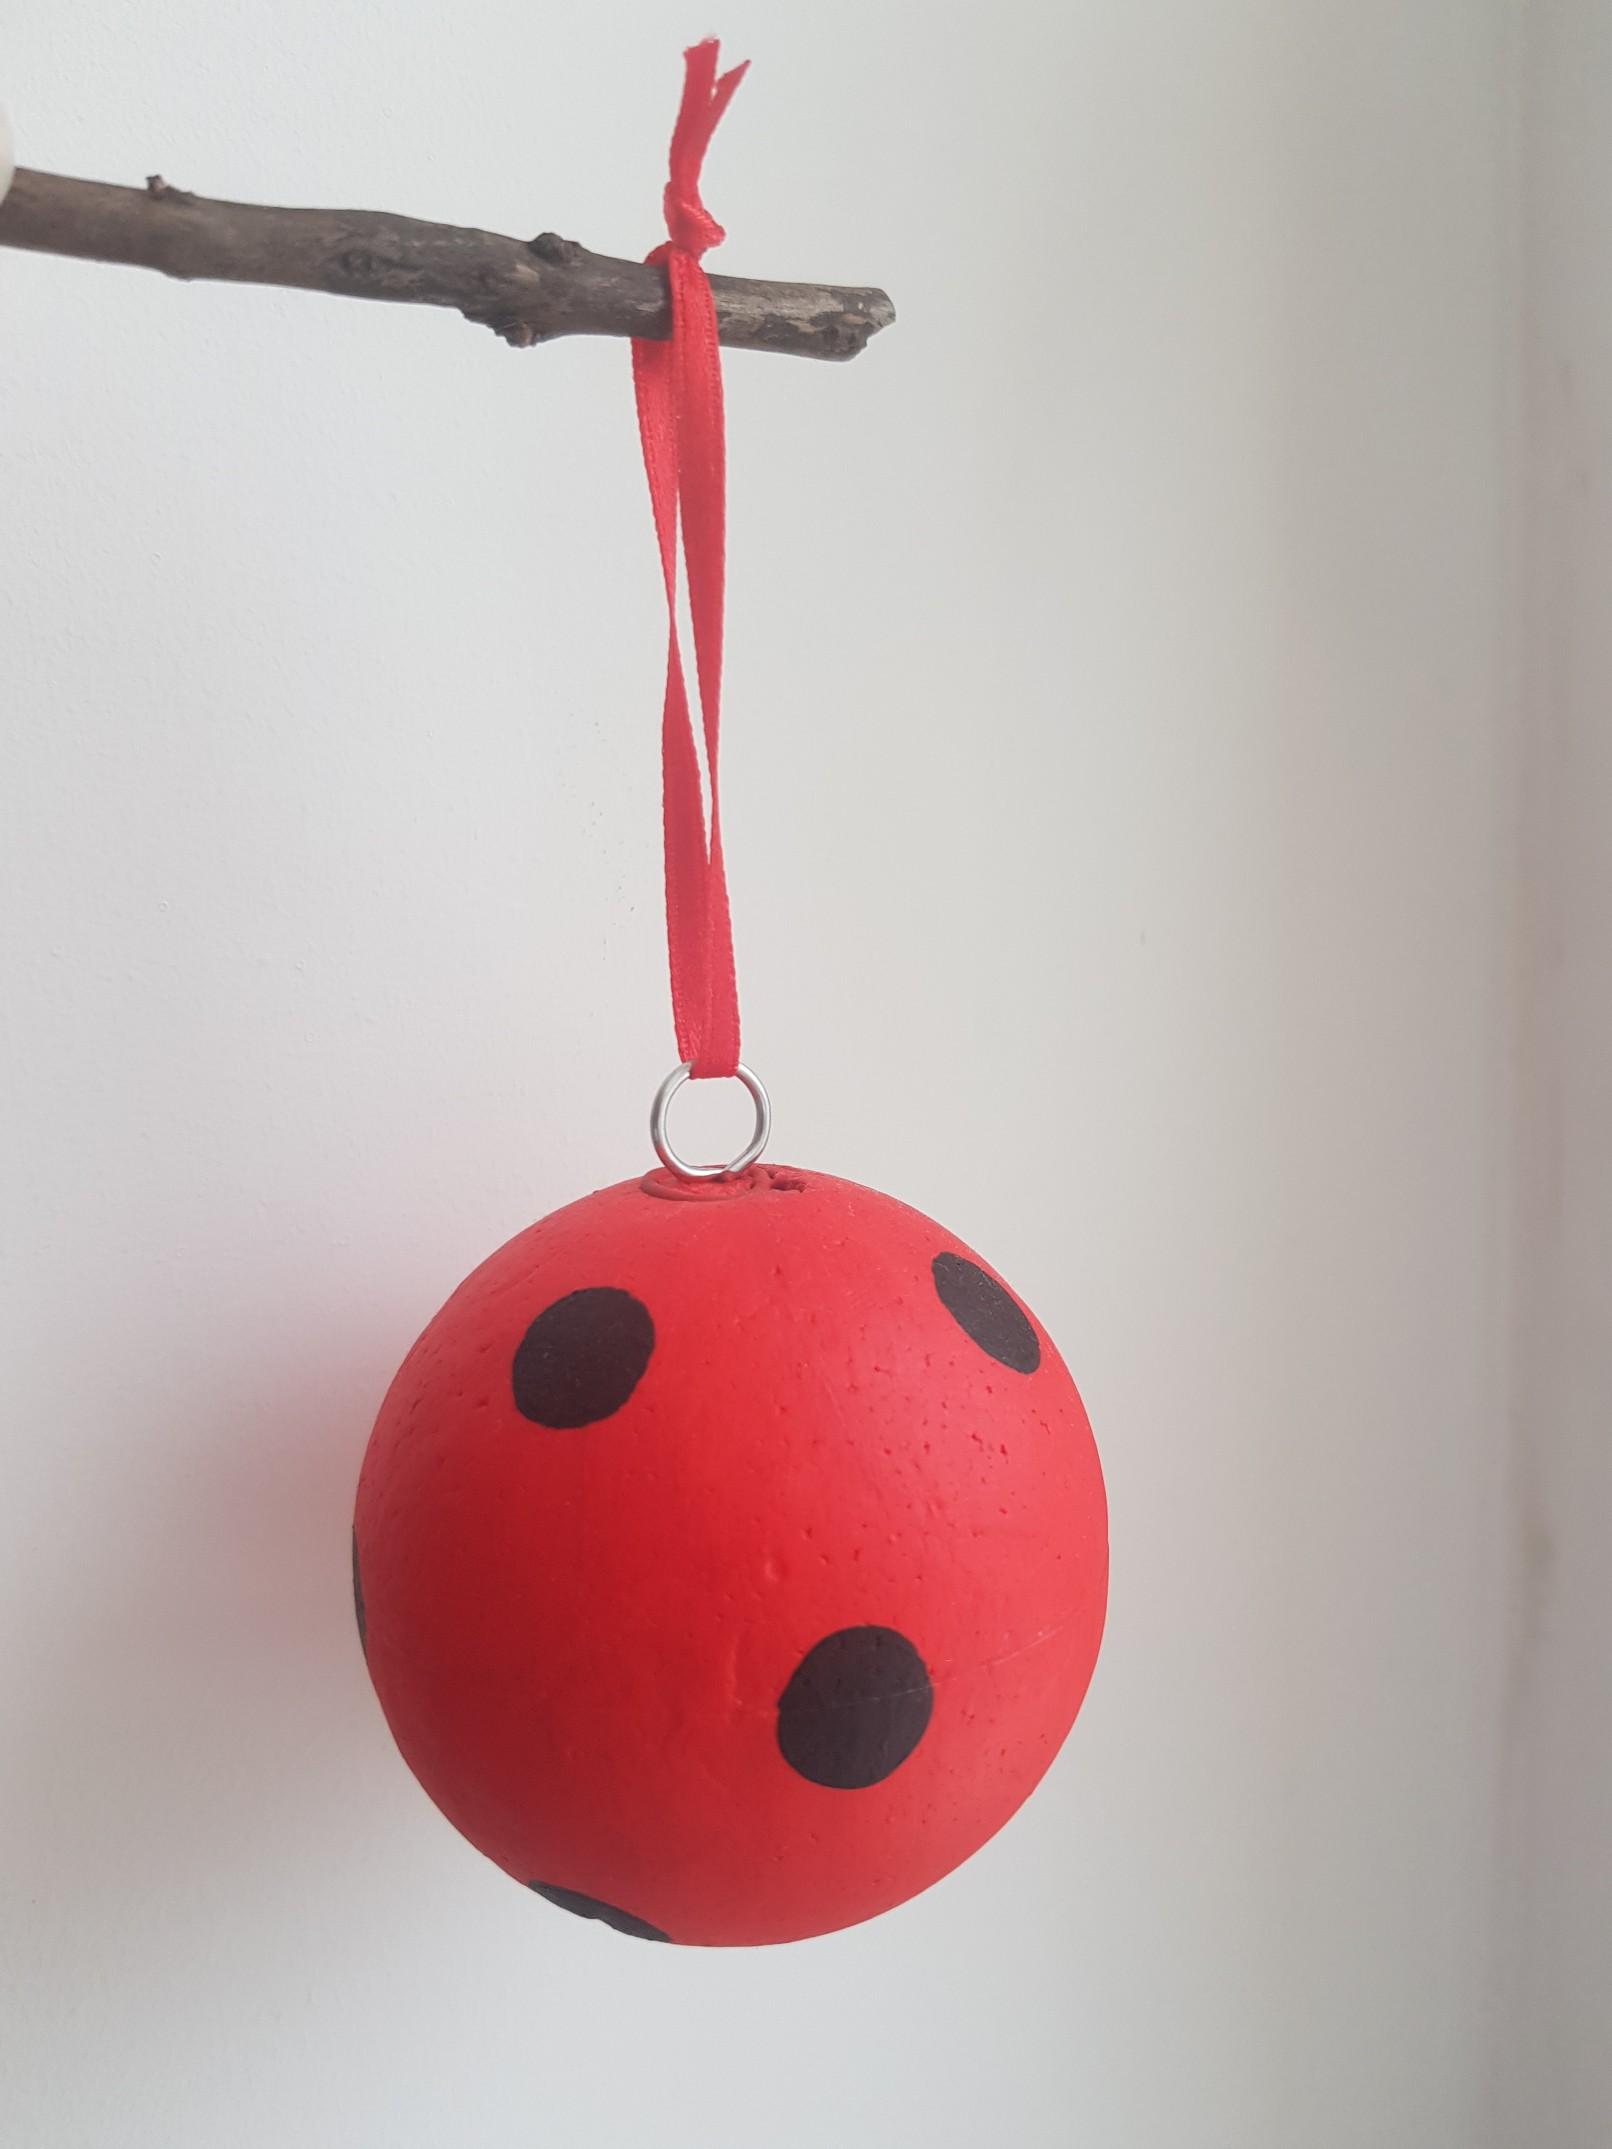 miraculous ladybug chat noir baubles red